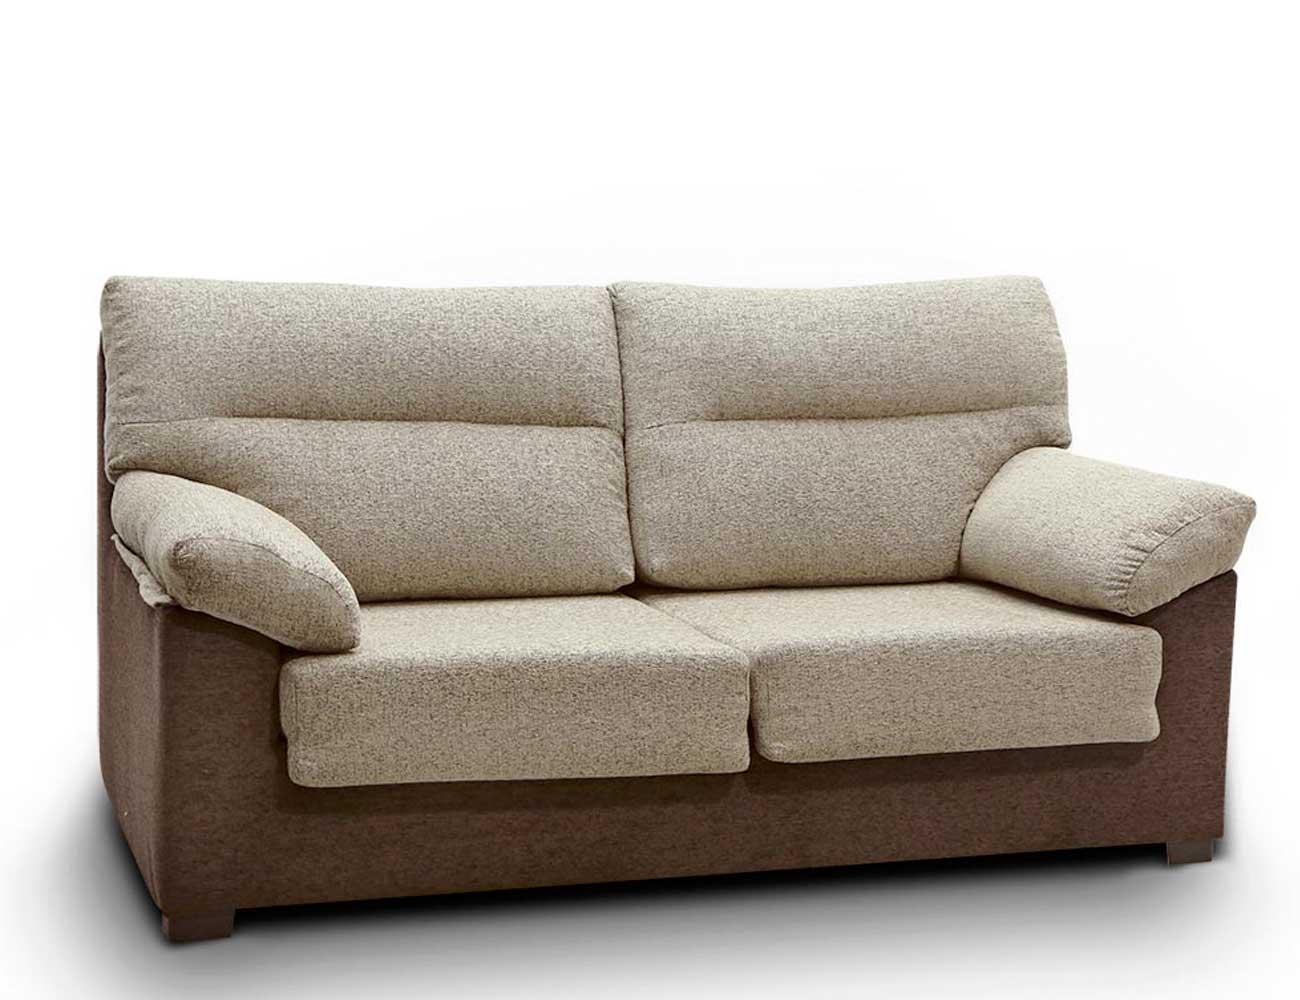 Sofa 3 plazas barato13